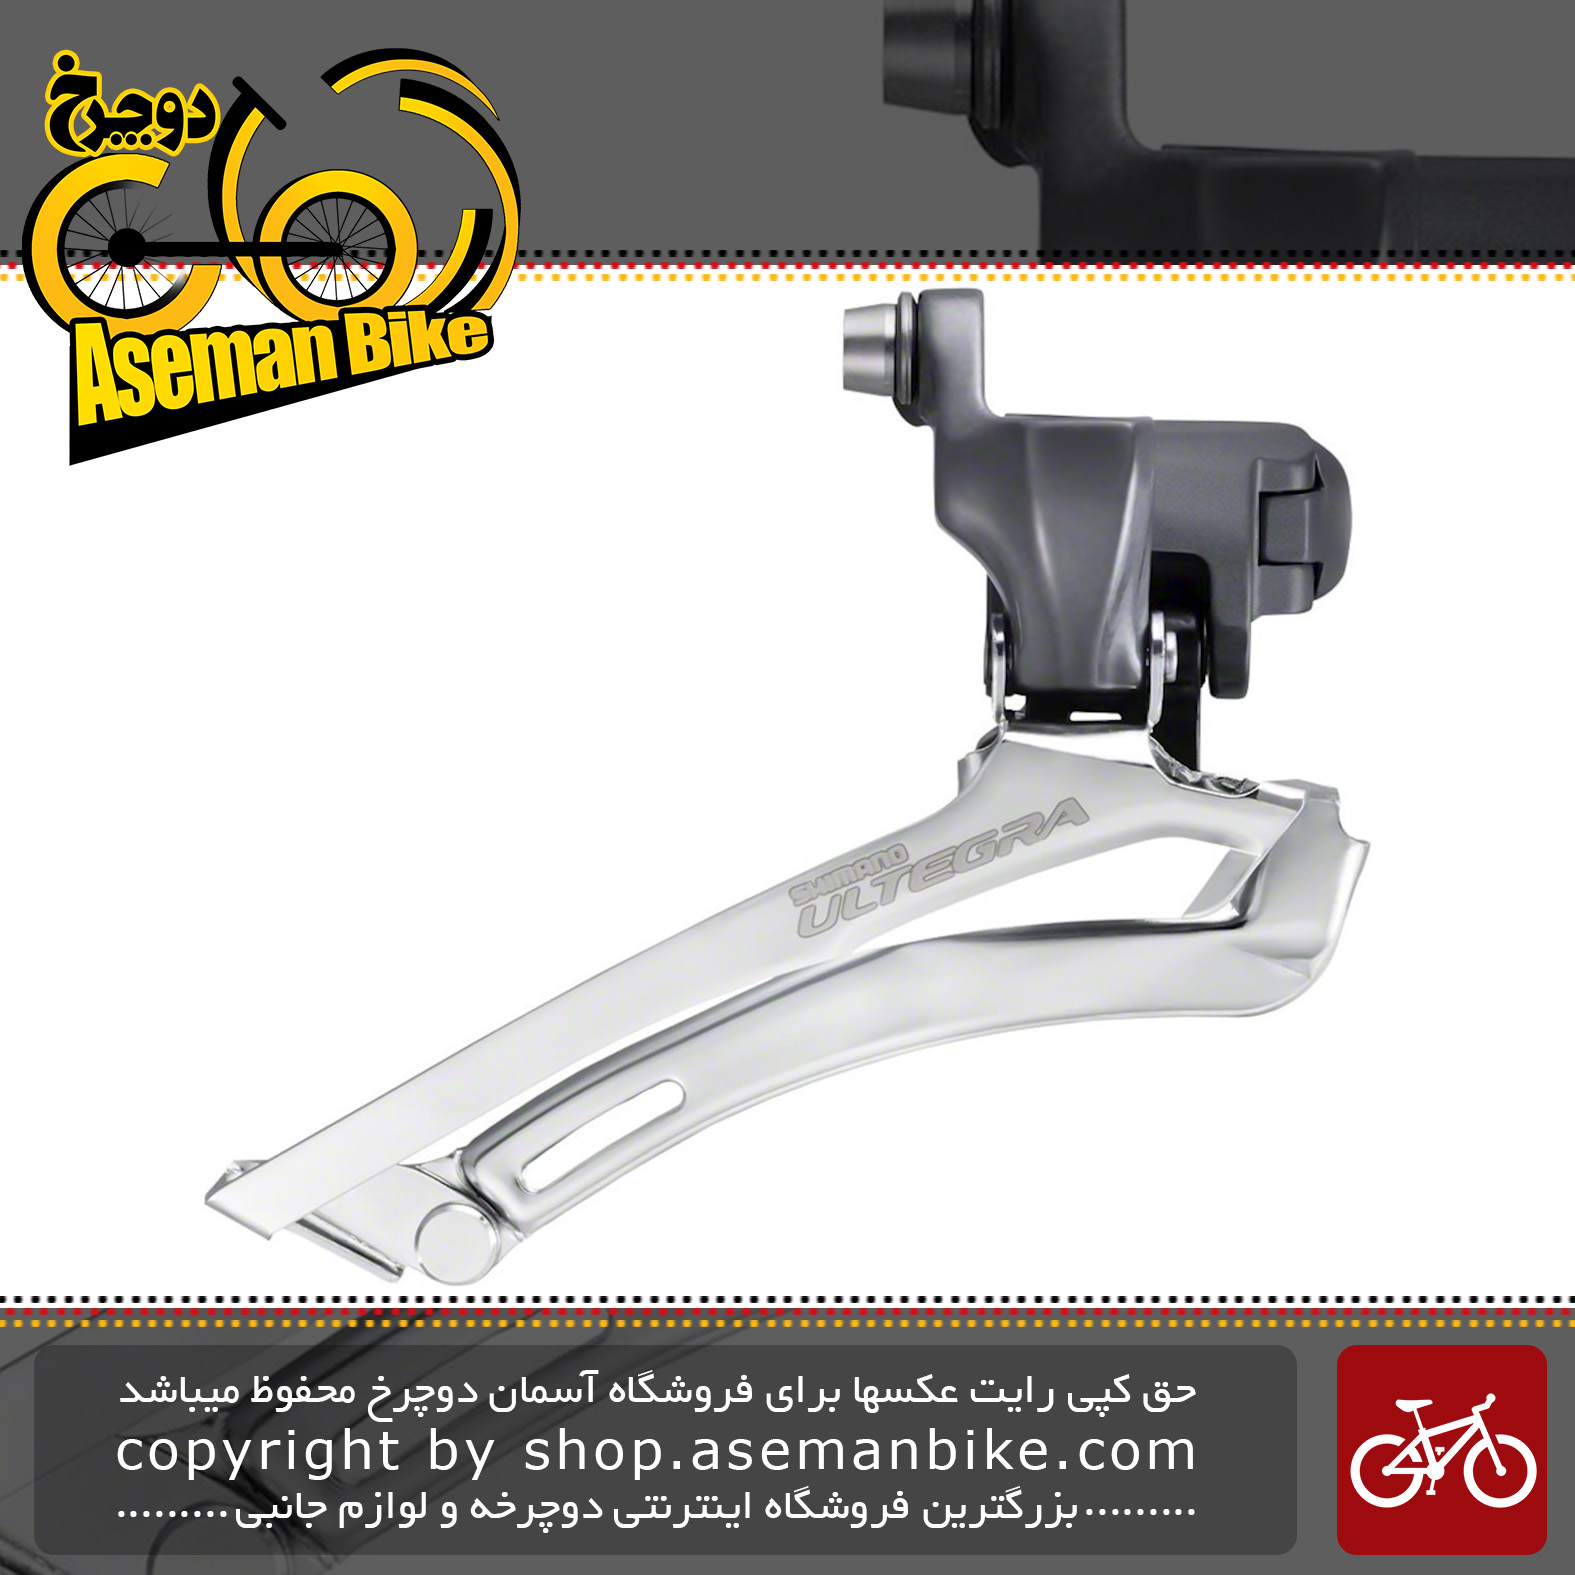 طبق عوض کن دوچرخه شیمانو التگرا 6700 Shimano Ultegra FD-6700-A Front Derailleur (2x10-speed)